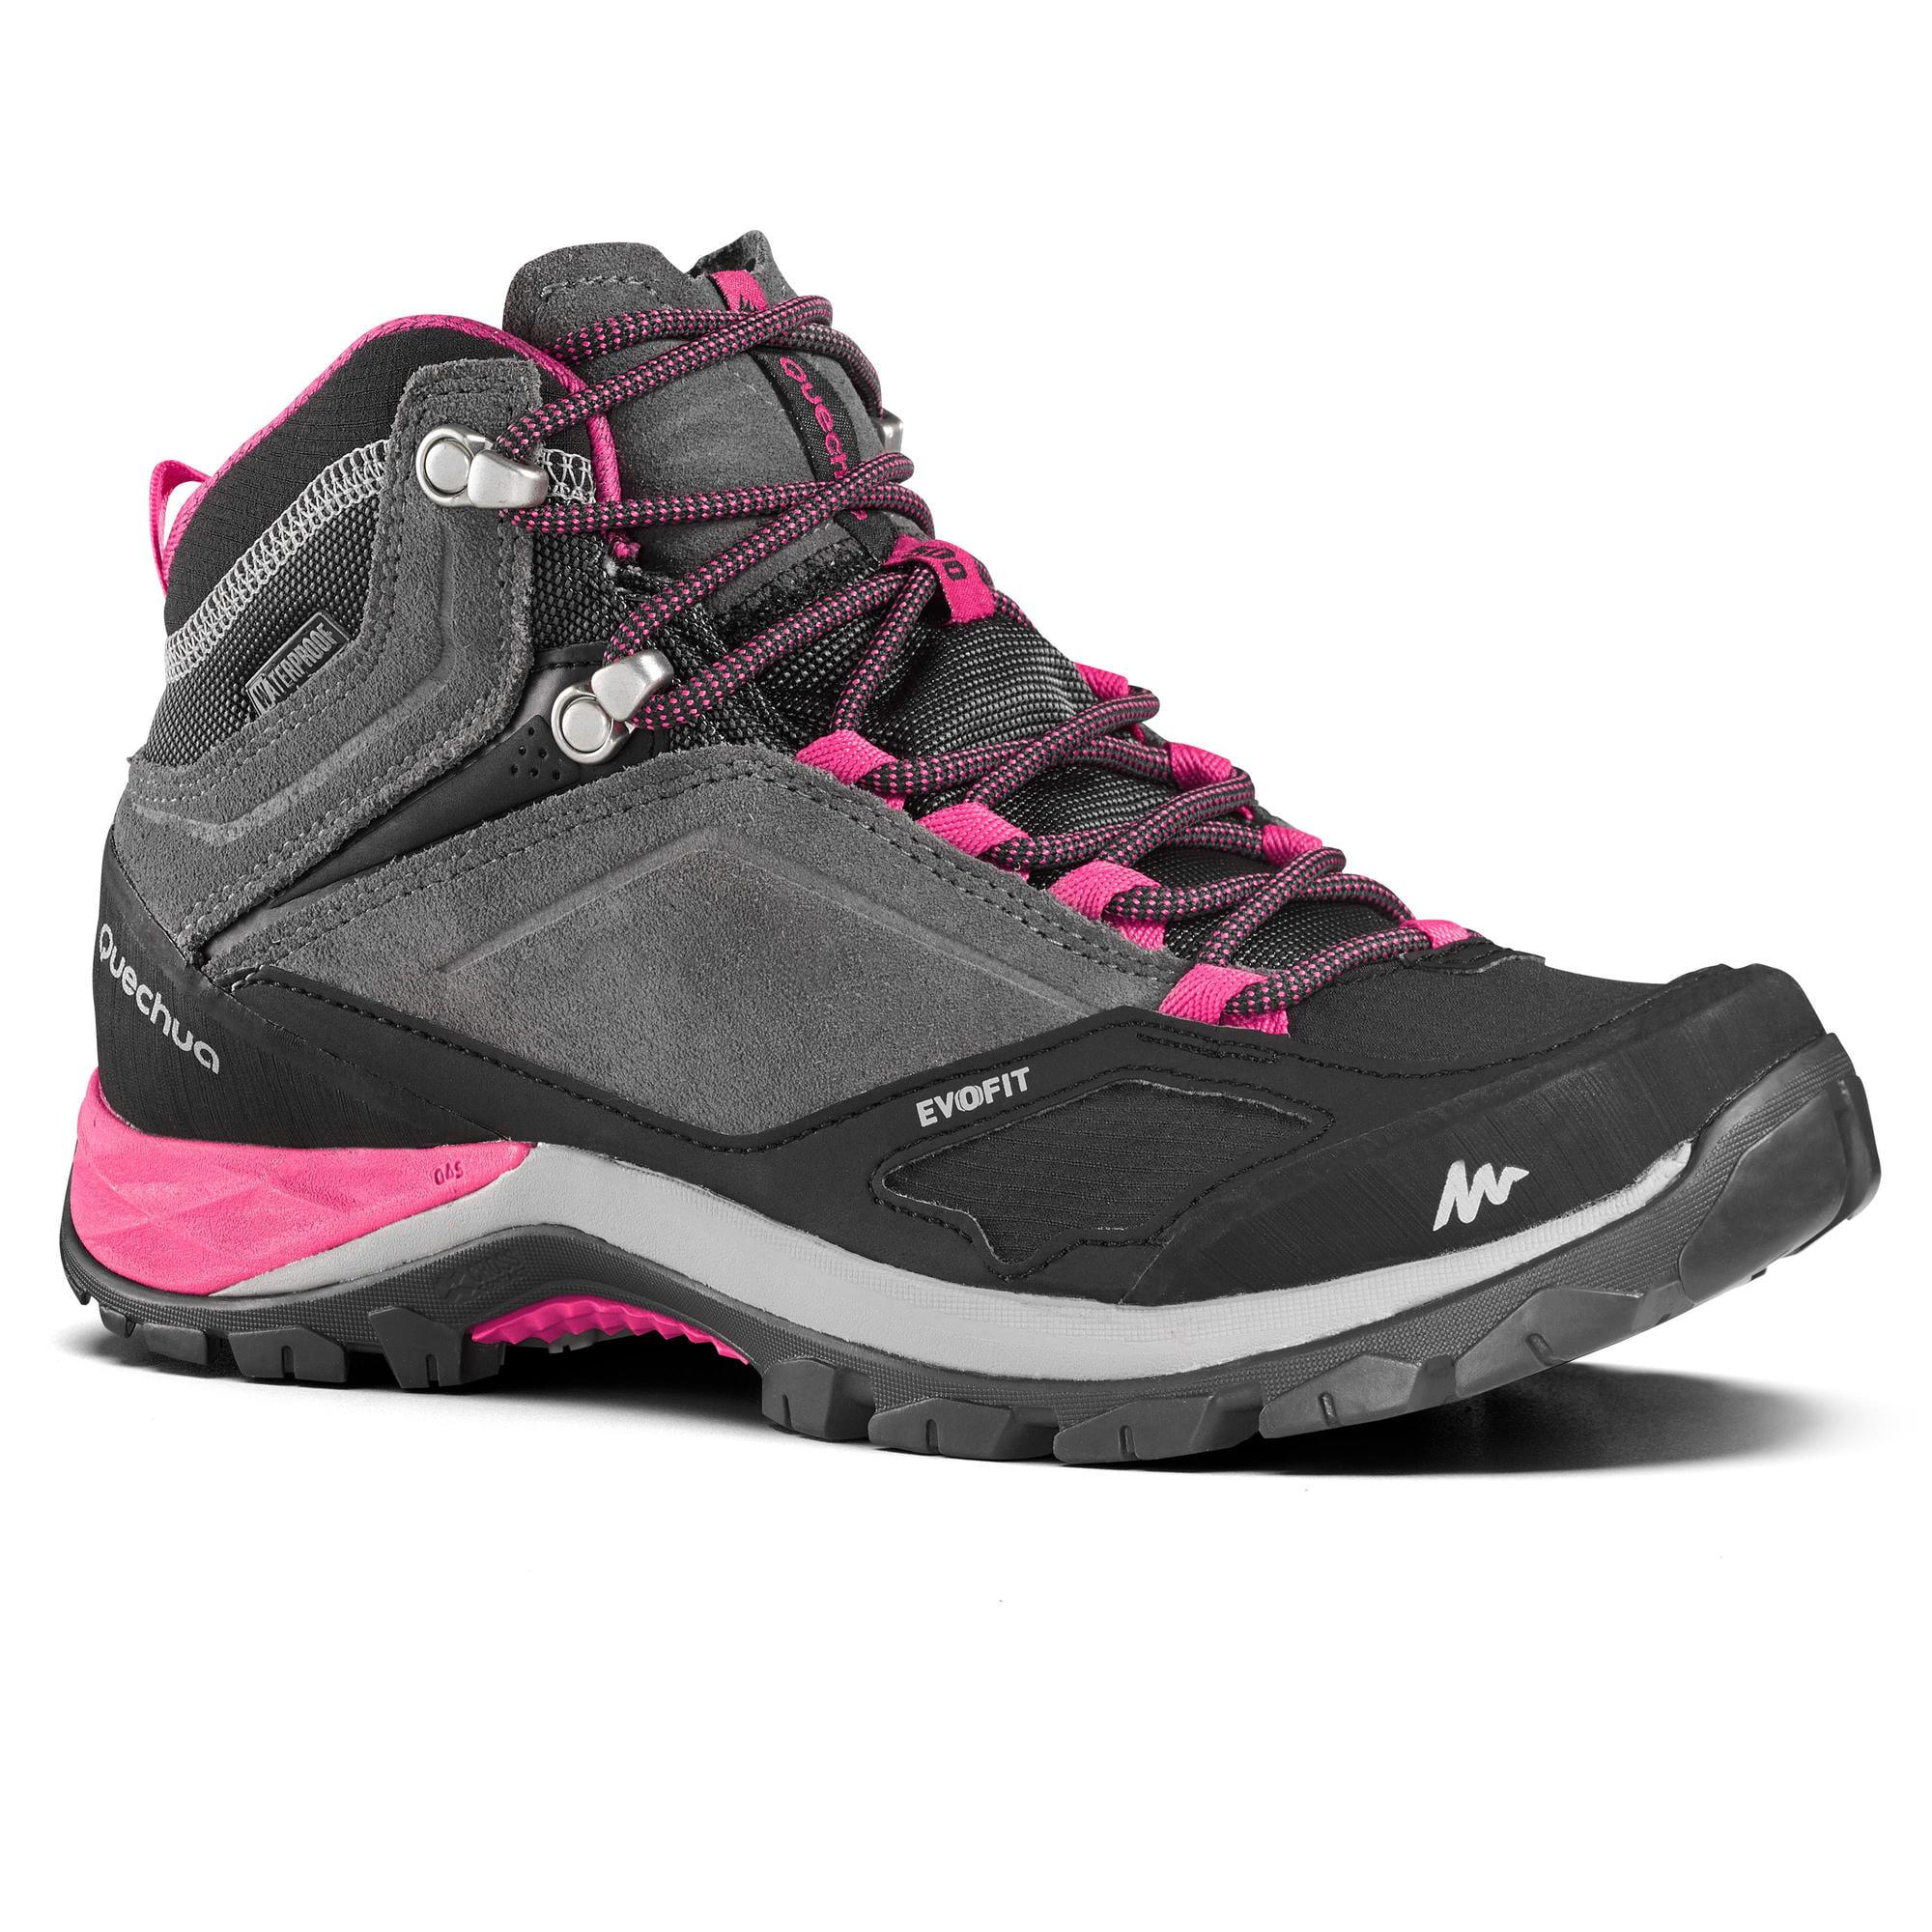 paso microondas negocio  Decathlon - Quechua by DECATHLON - Women's MH500 Mid Waterproof Hiking  Shoes - Walmart.com - Walmart.com